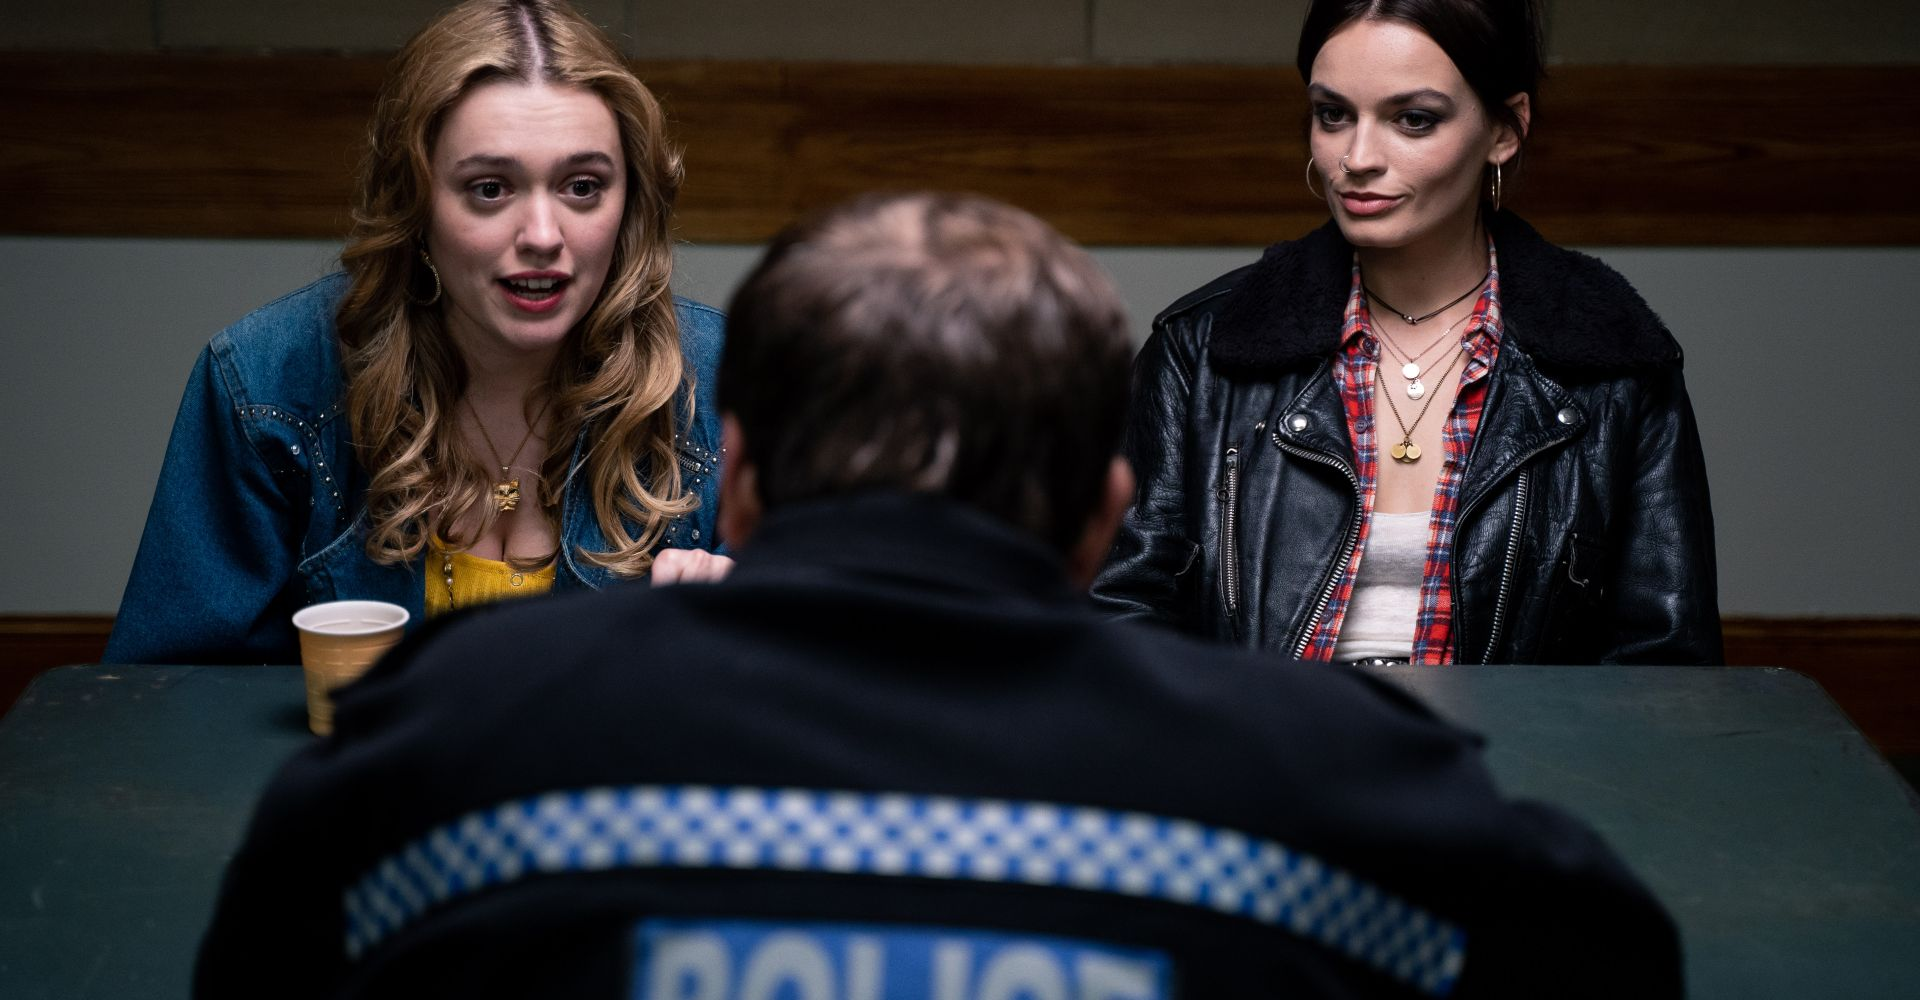 "Offizielles Bild aus der zweiten Staffel der Netflix-Serie ""Sex Education""."